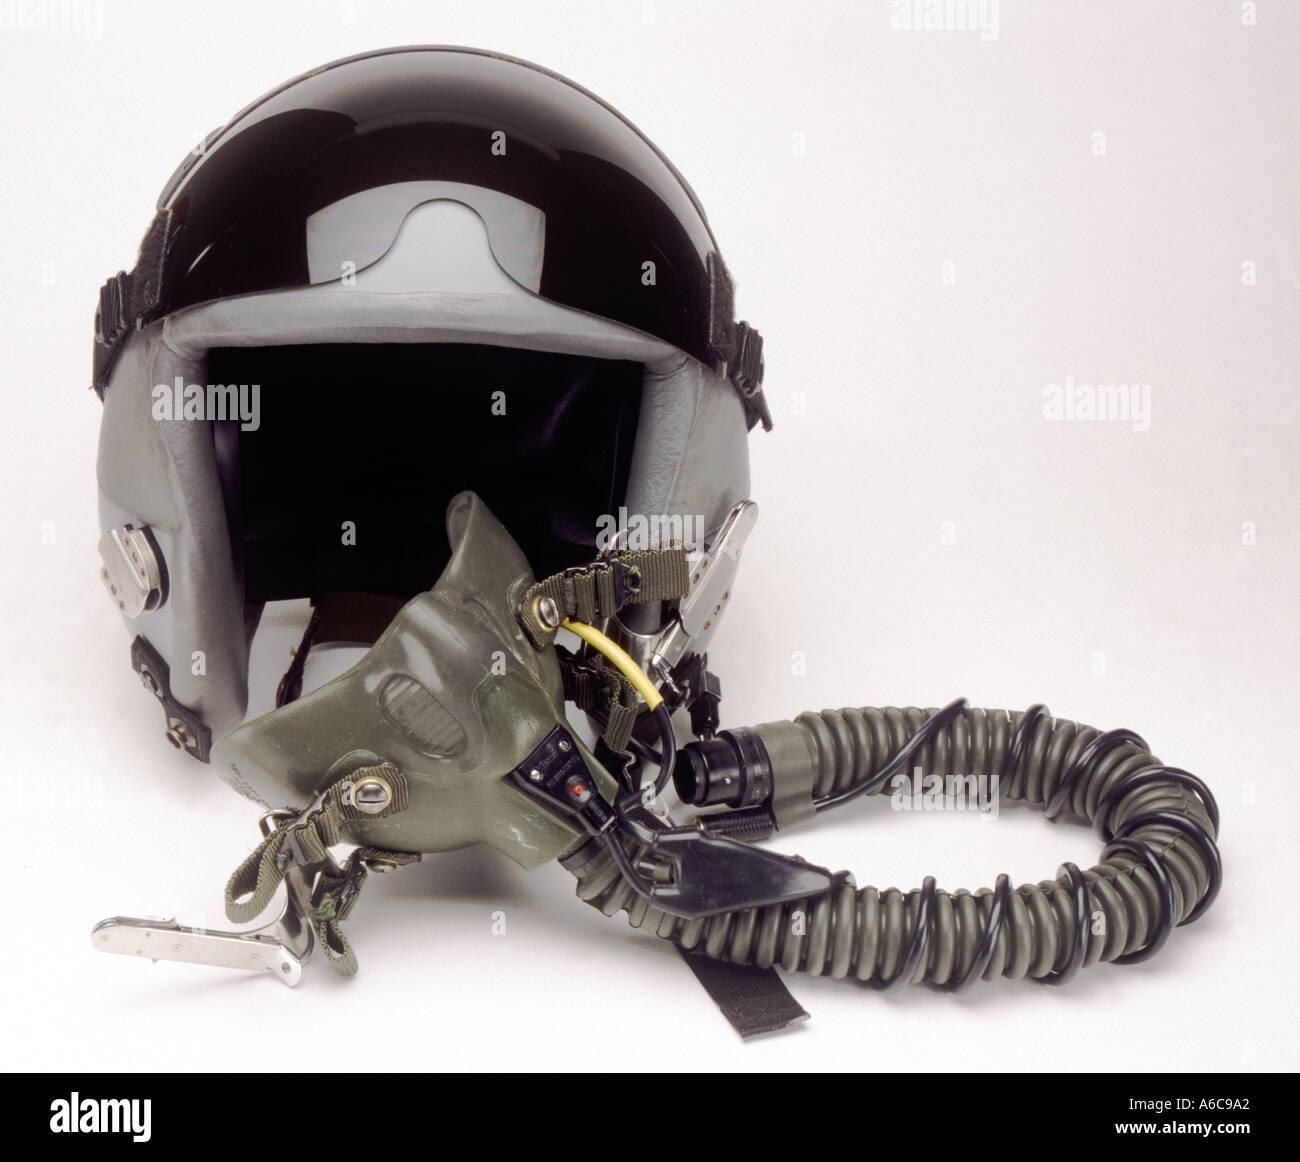 Dating military pilots helmets